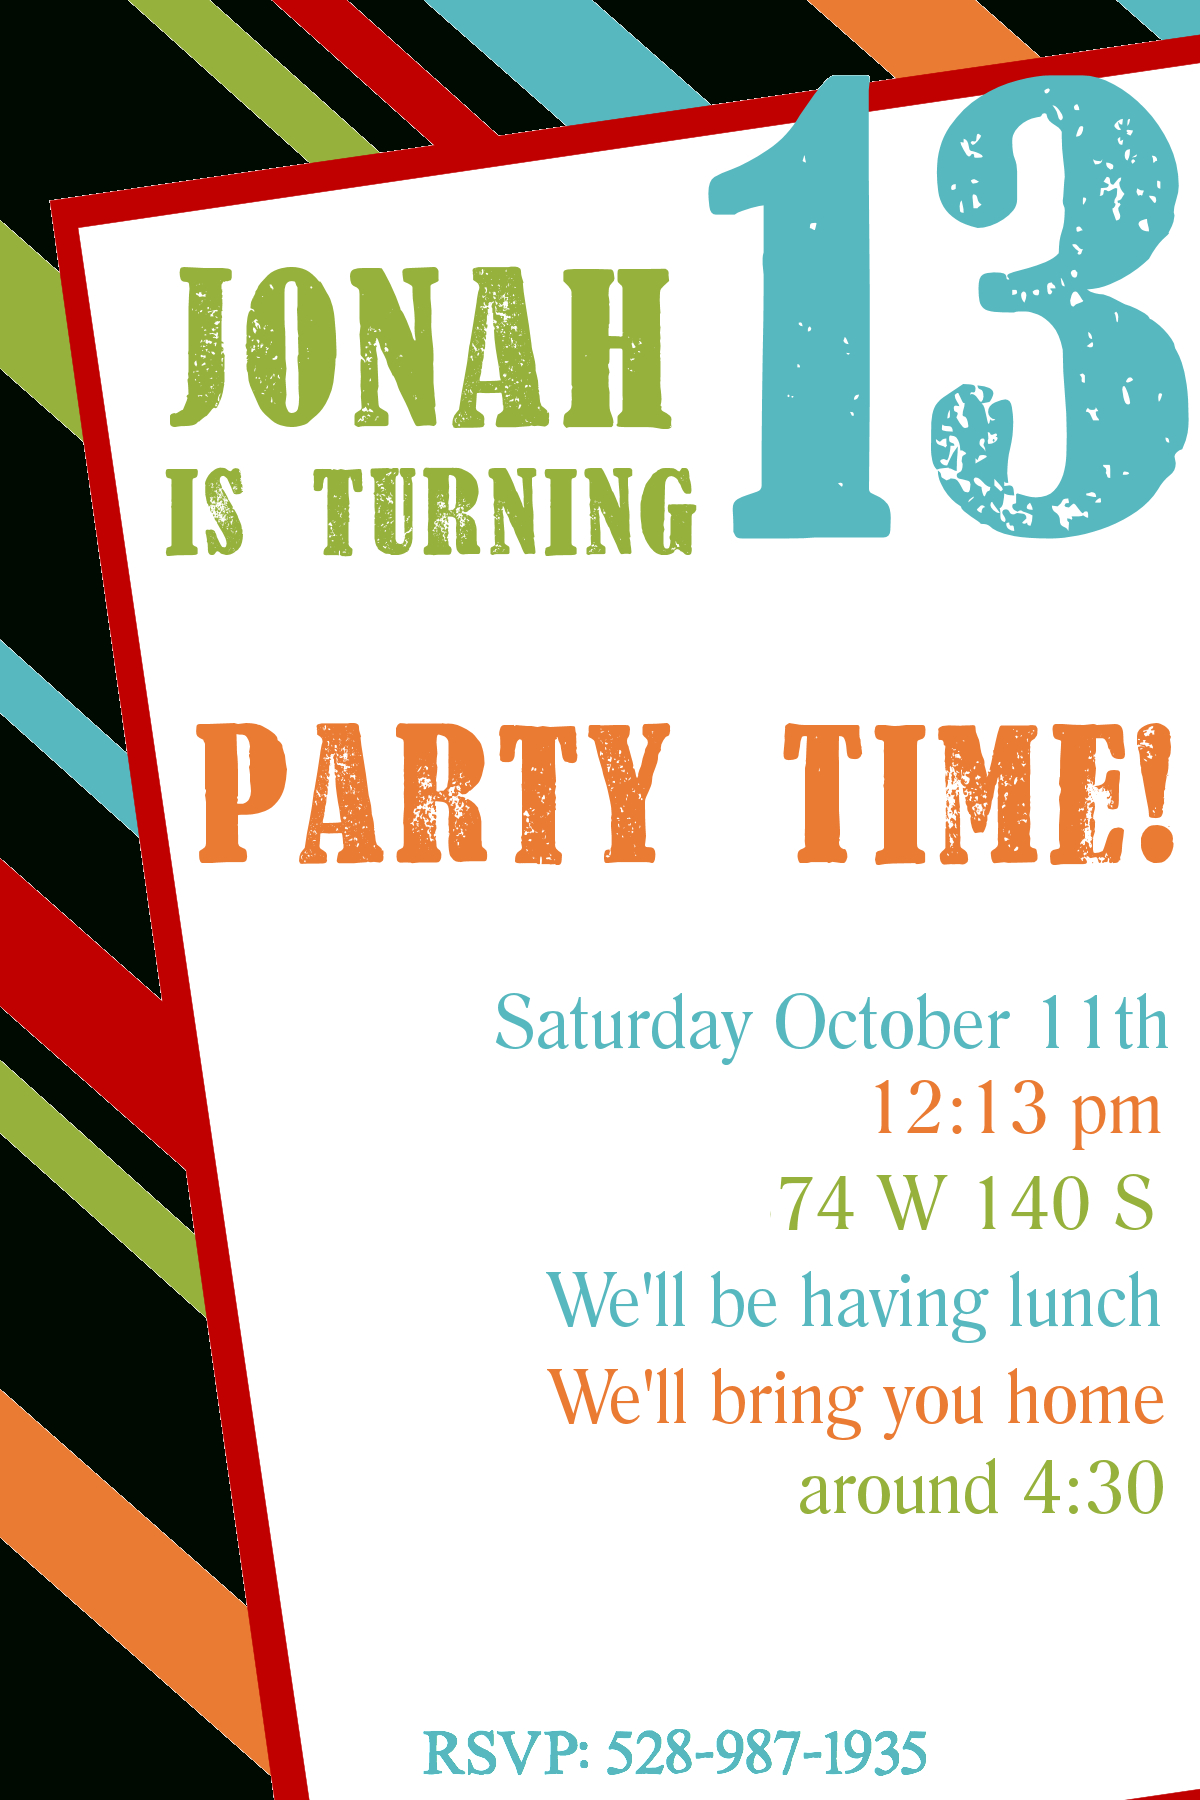 Free Printable Birthday Invitation Templates   Printables   Free - Free Stork Party Invitations Printable